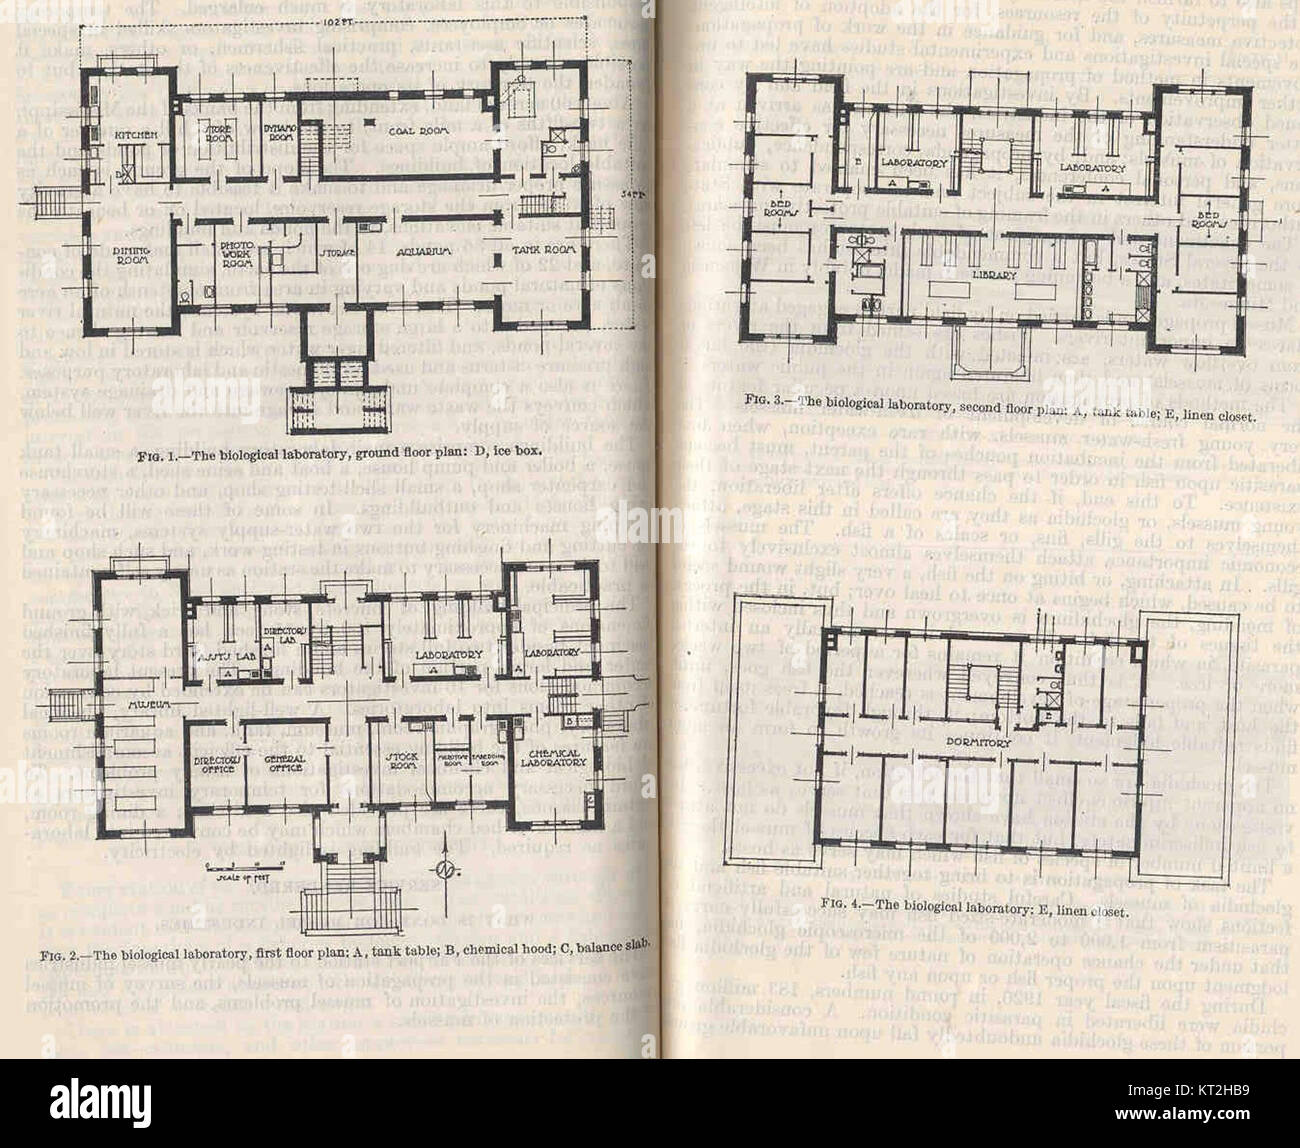 35072 Biological Laboratory Fig1 Ground Floor Plan Fig 2 First Floor Plan Fig3 Second Floor Plan Fig 4 Dormitory Stock Photo Alamy